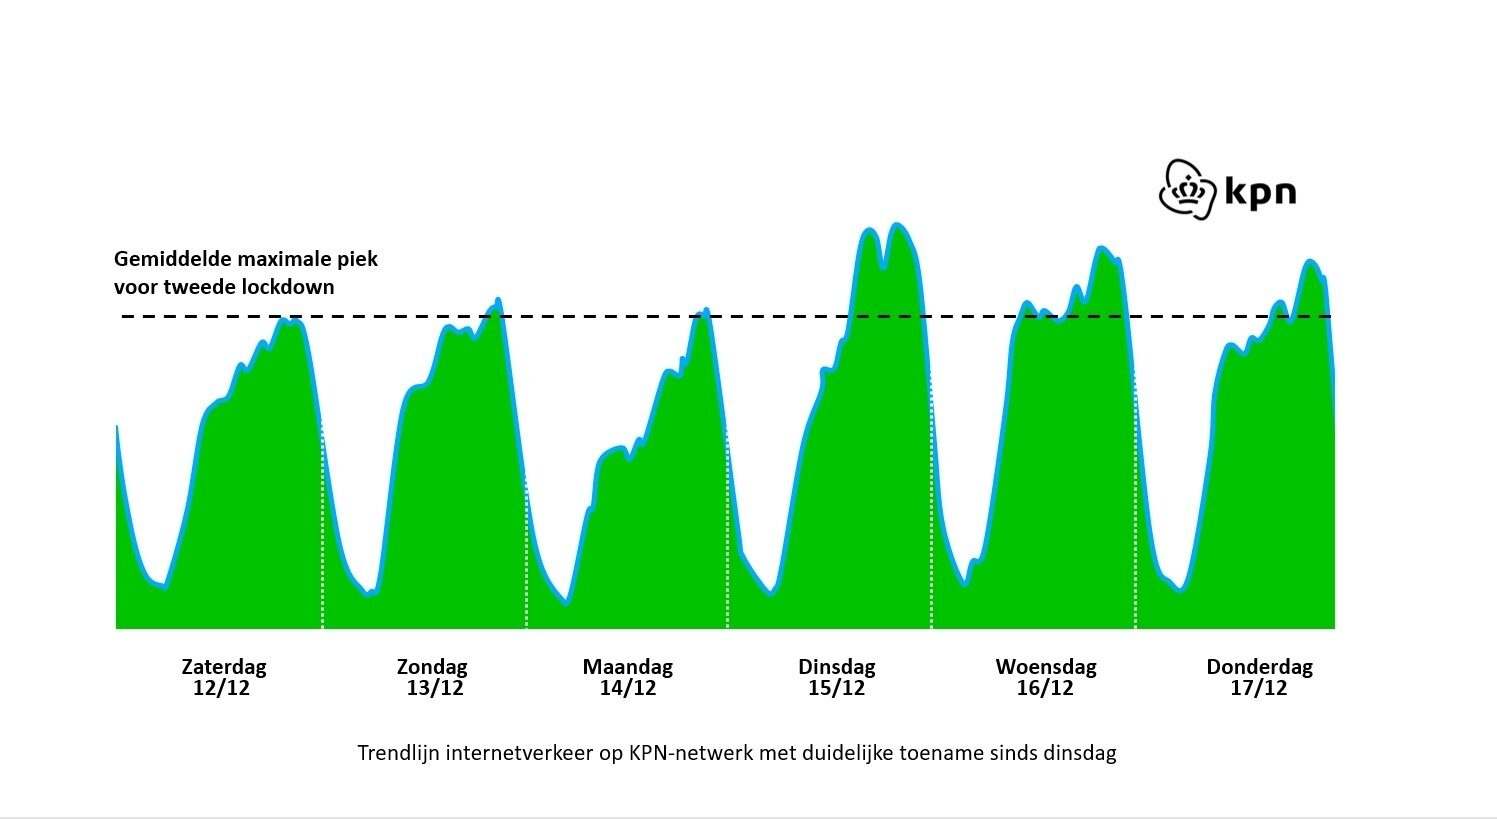 Trendlijn internetverkeer kpn